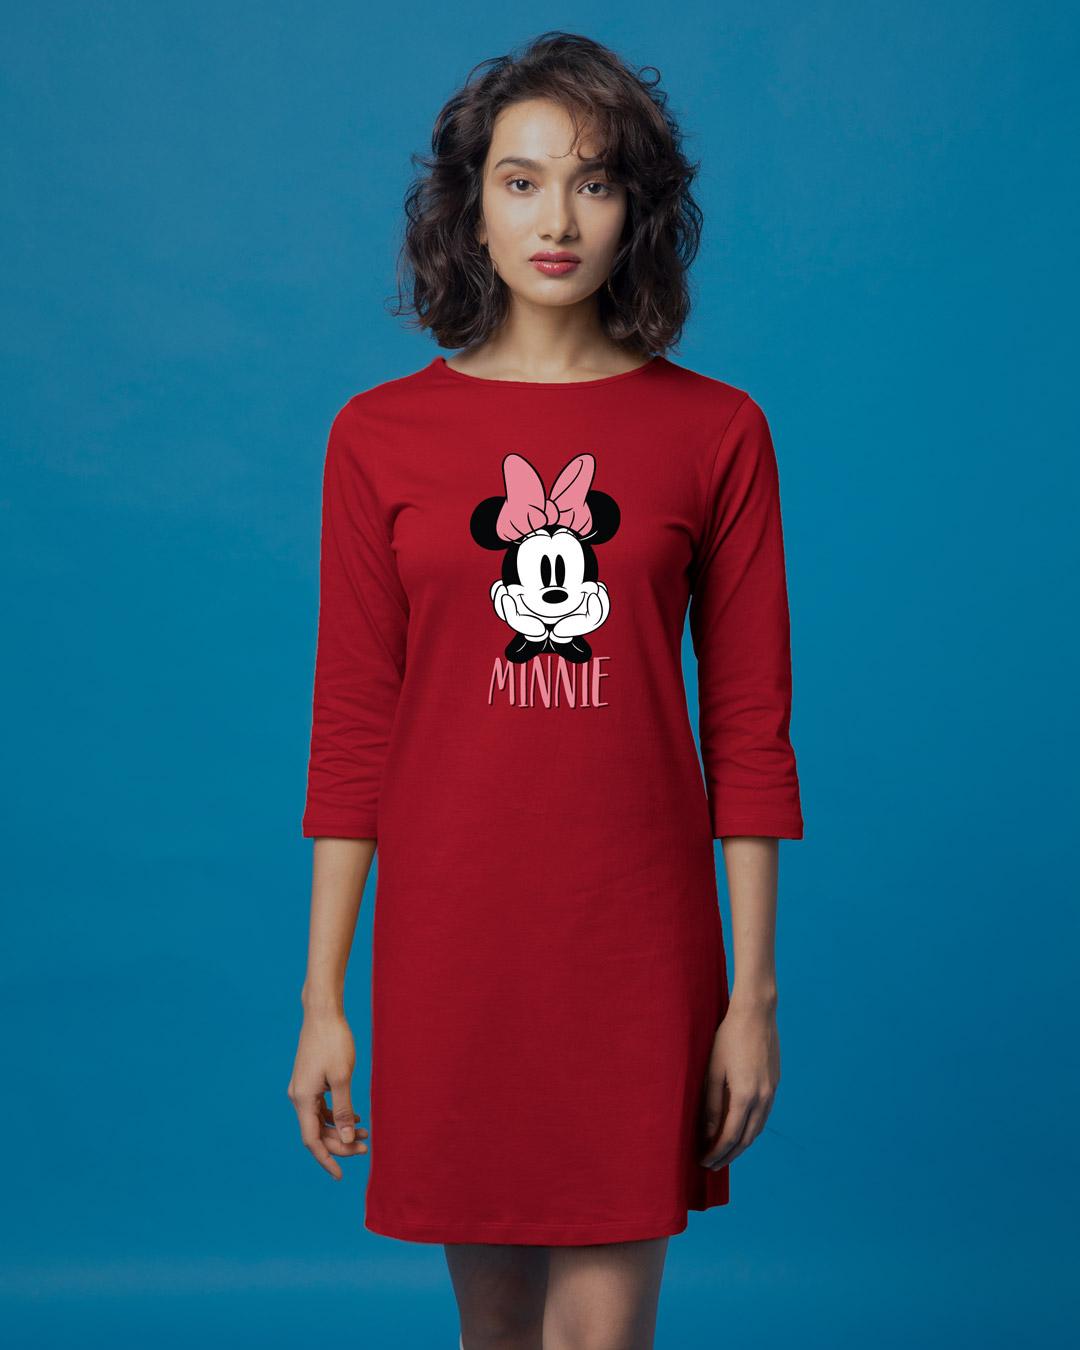 Buy Cute Minnie Printed 34 Sleeve T Shirt Dress For Women Online